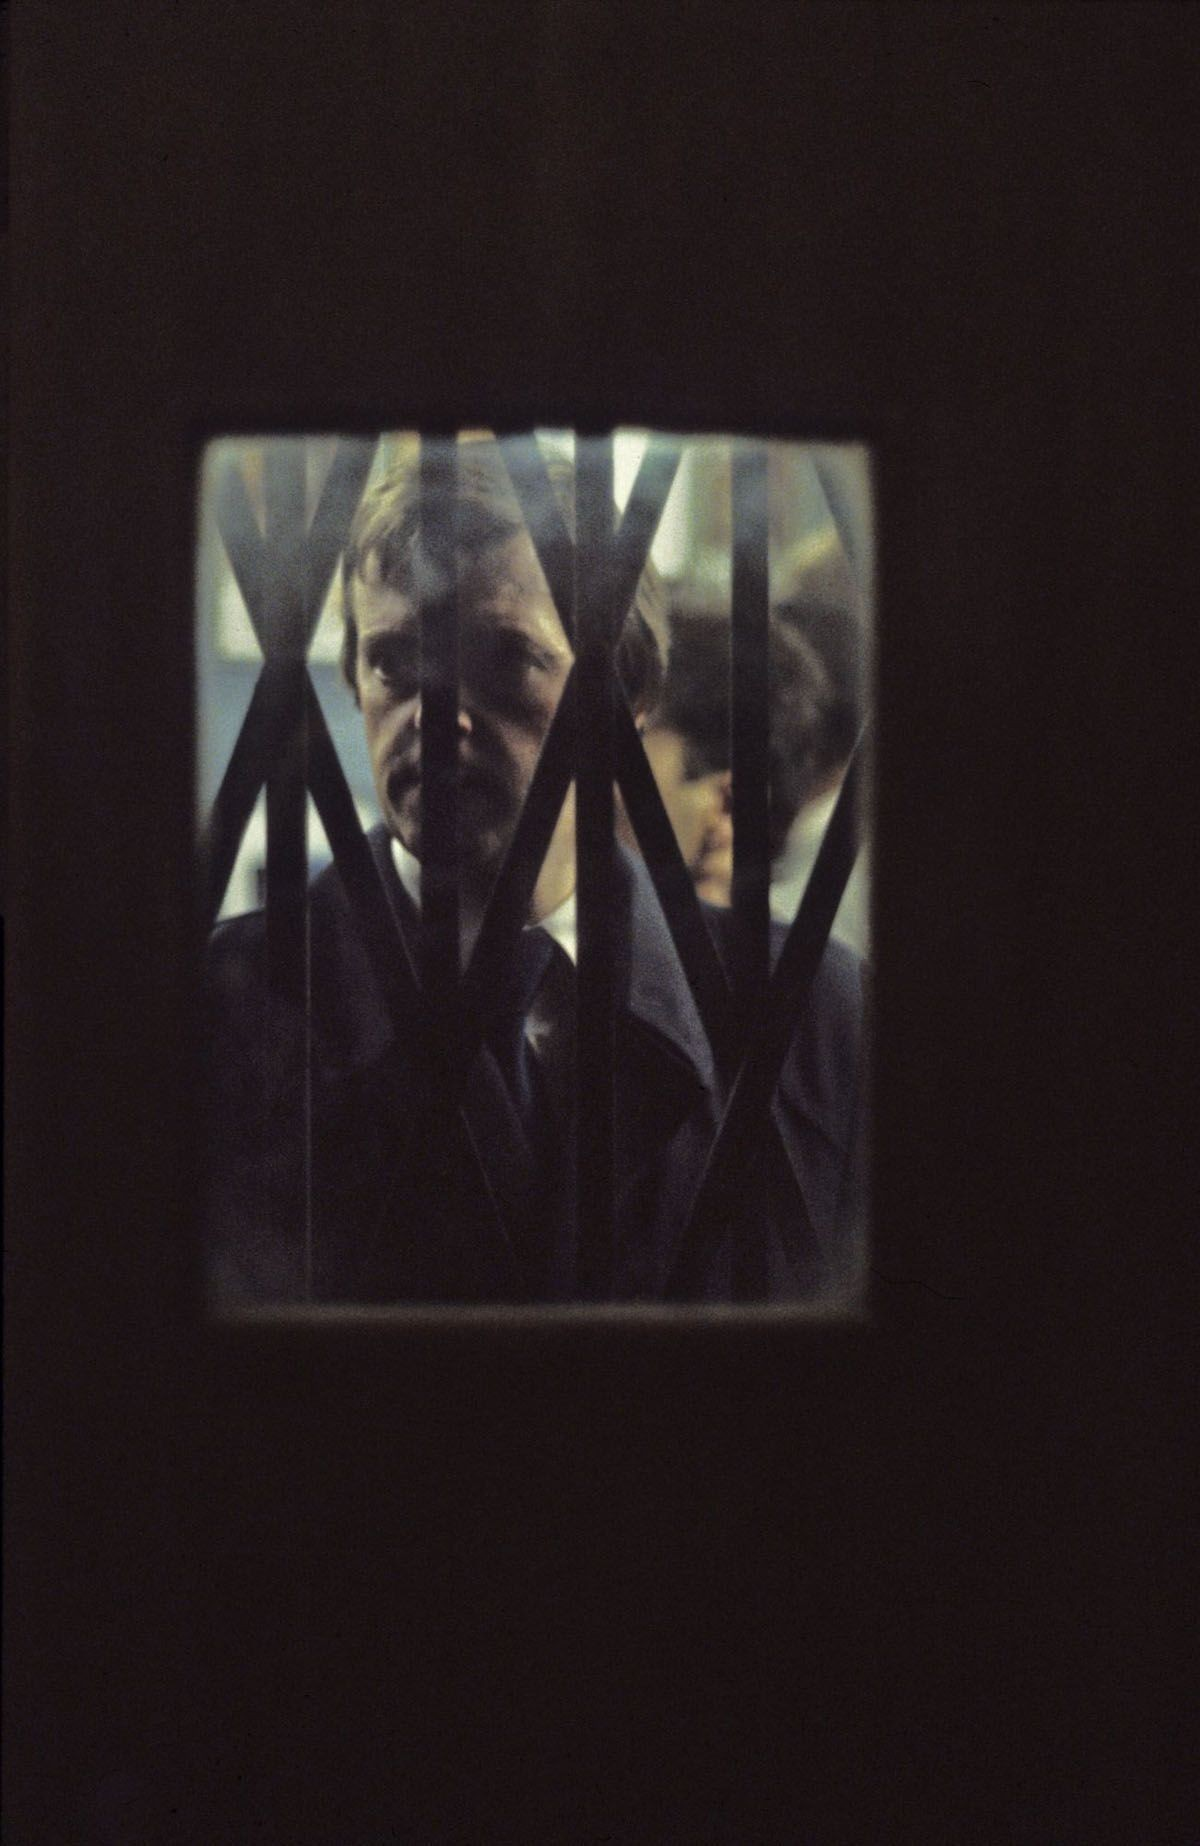 Человек в метро. Лондон, 1980-е. Боб Маззер